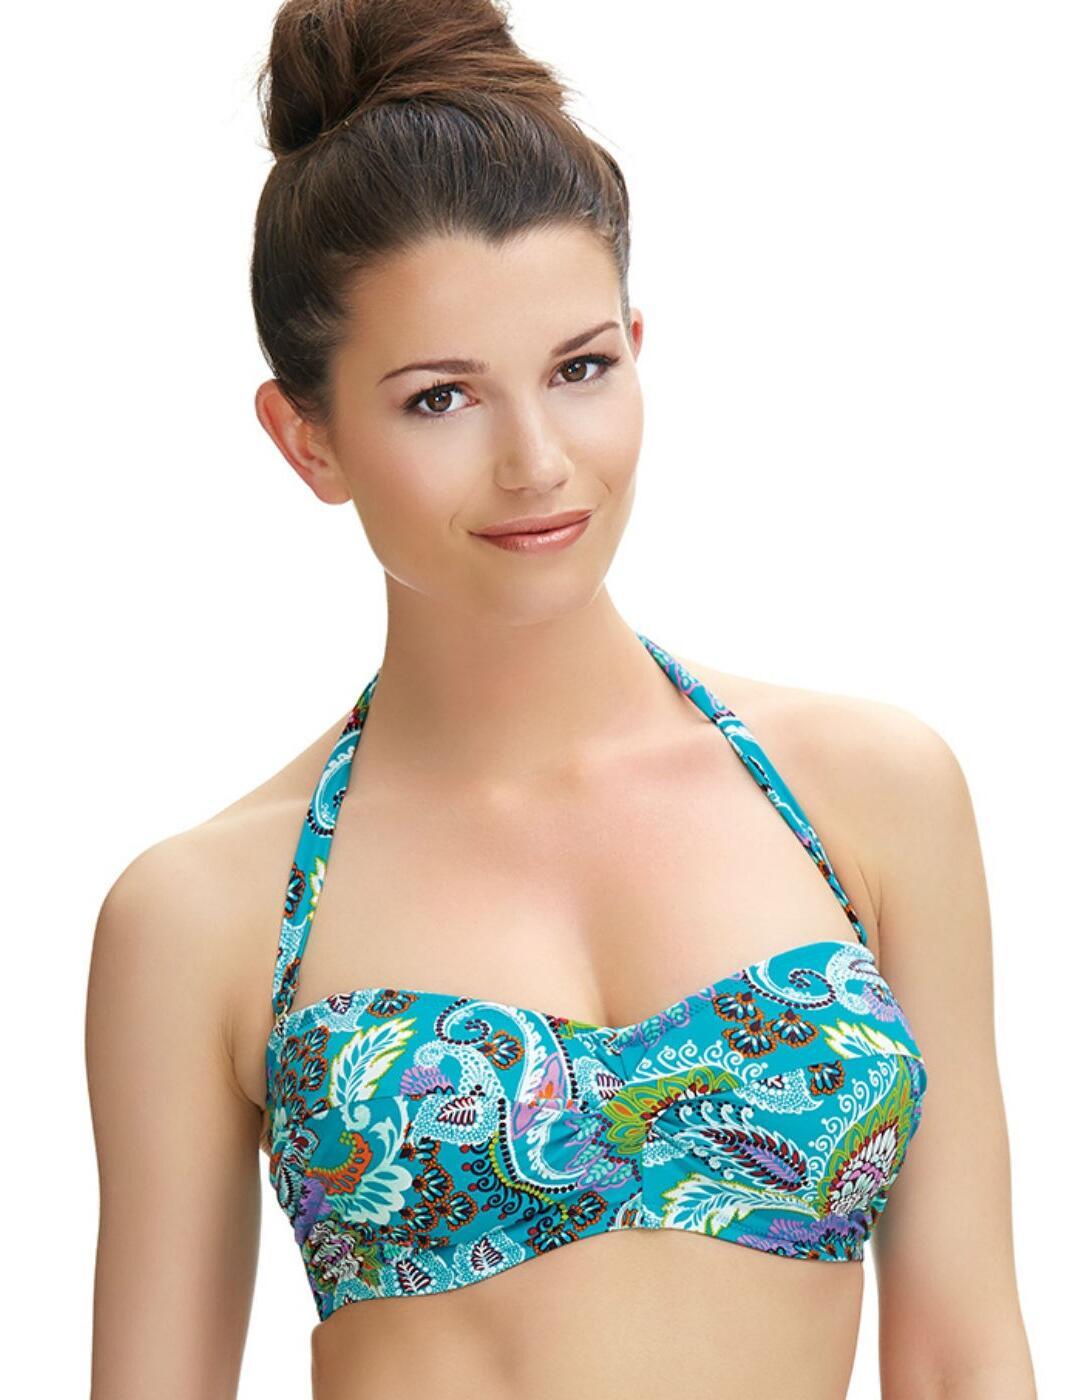 6267 Fantasie Viana Twist Bandeau Bikini Top Multi - 6267 Twist Bandeau